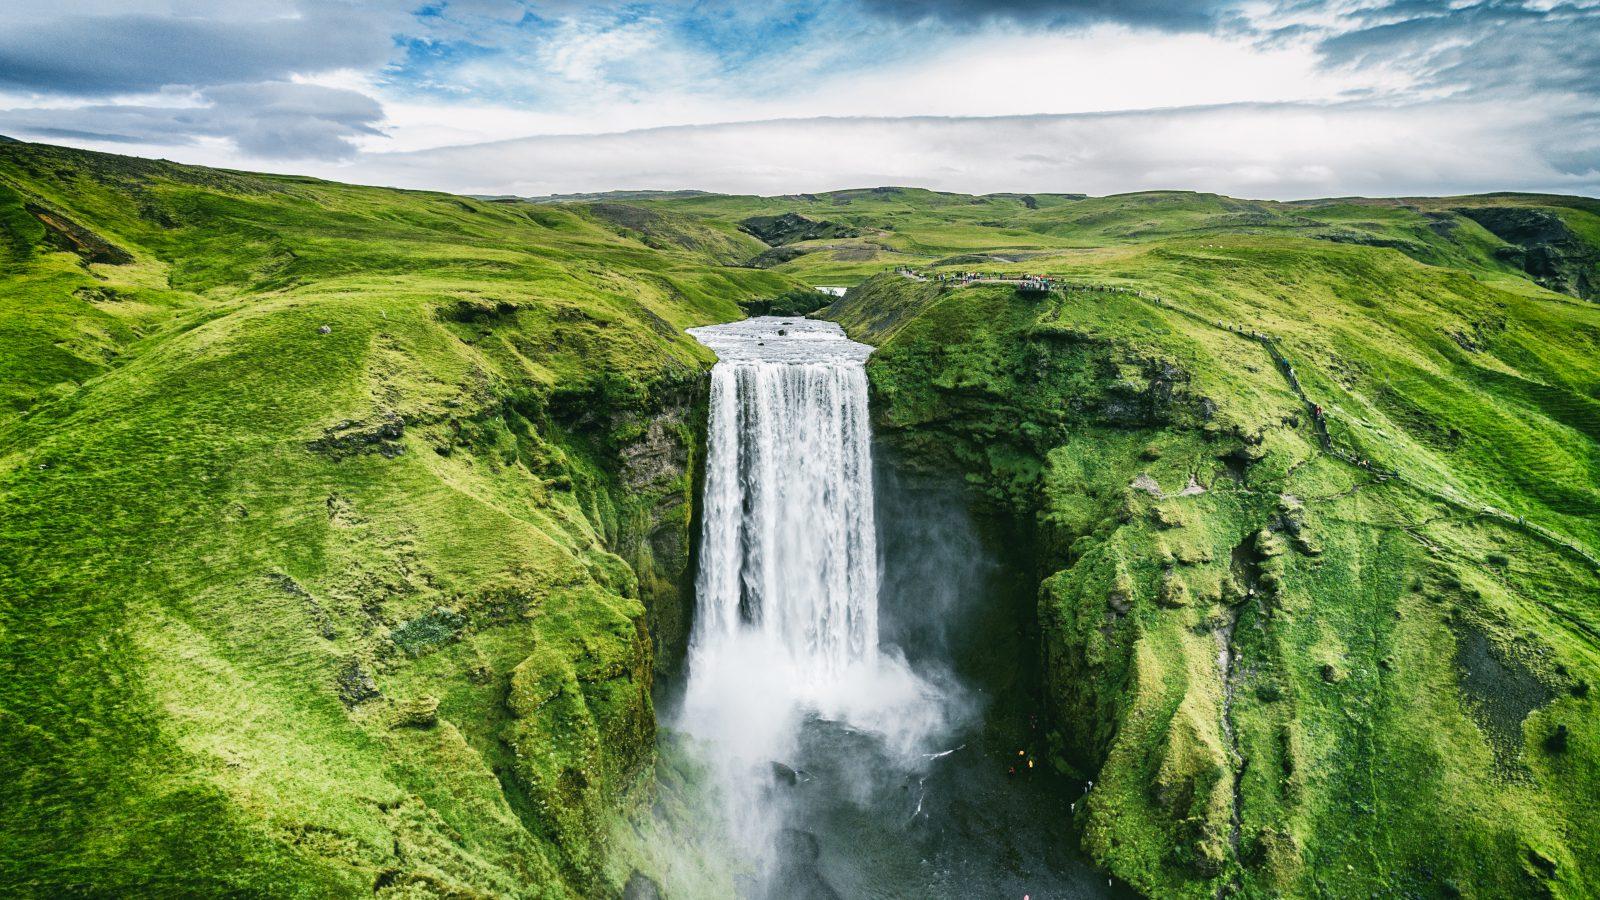 Photo of Skogafoss waterfall in Iceland.